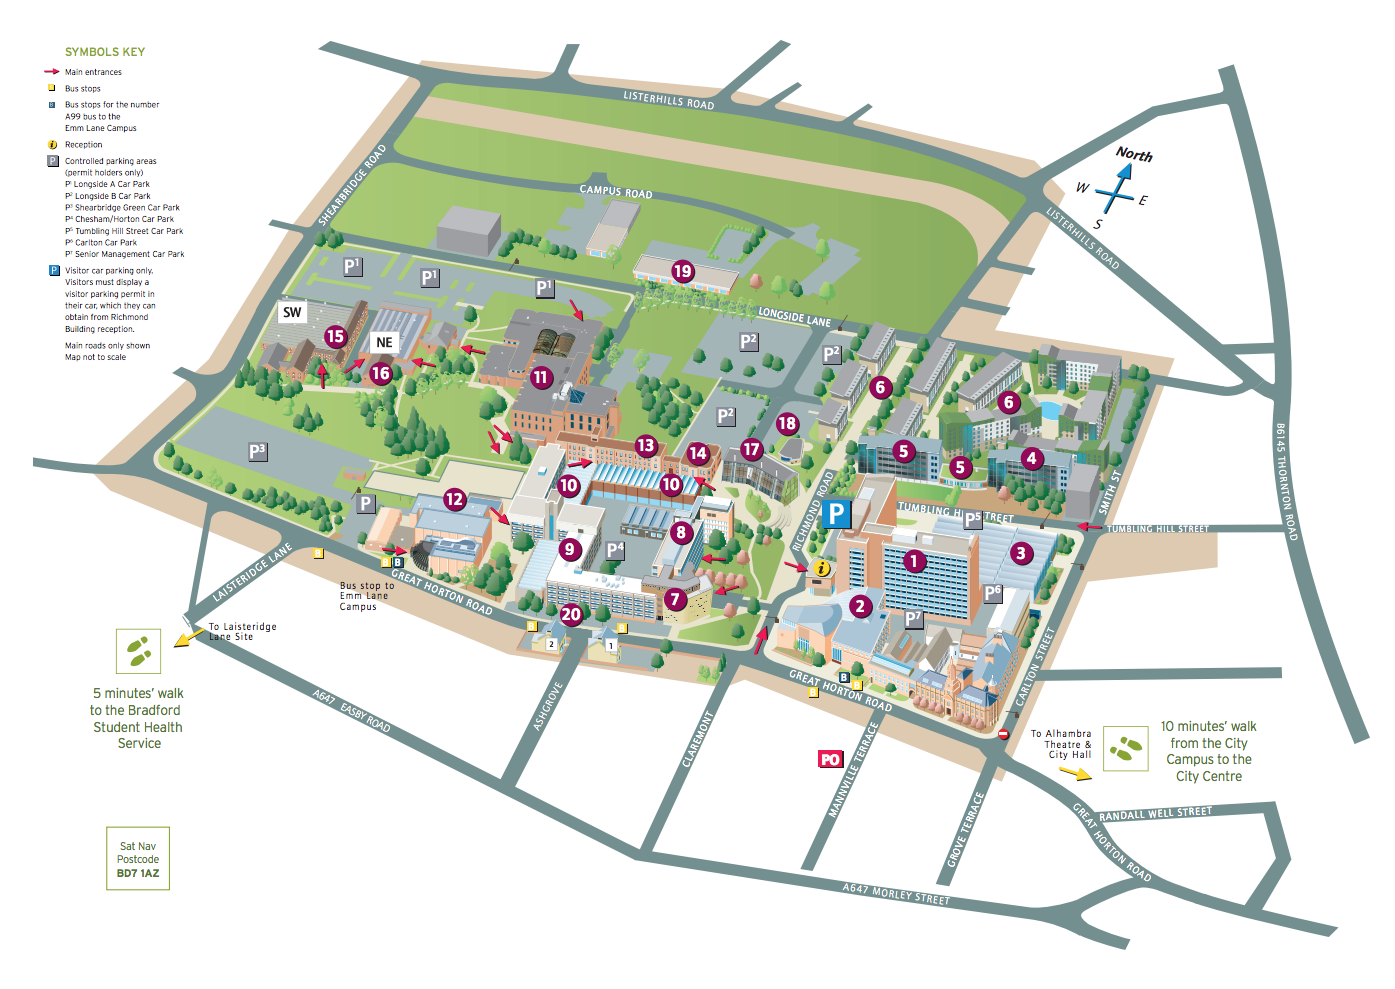 University of Bradford Campus Map